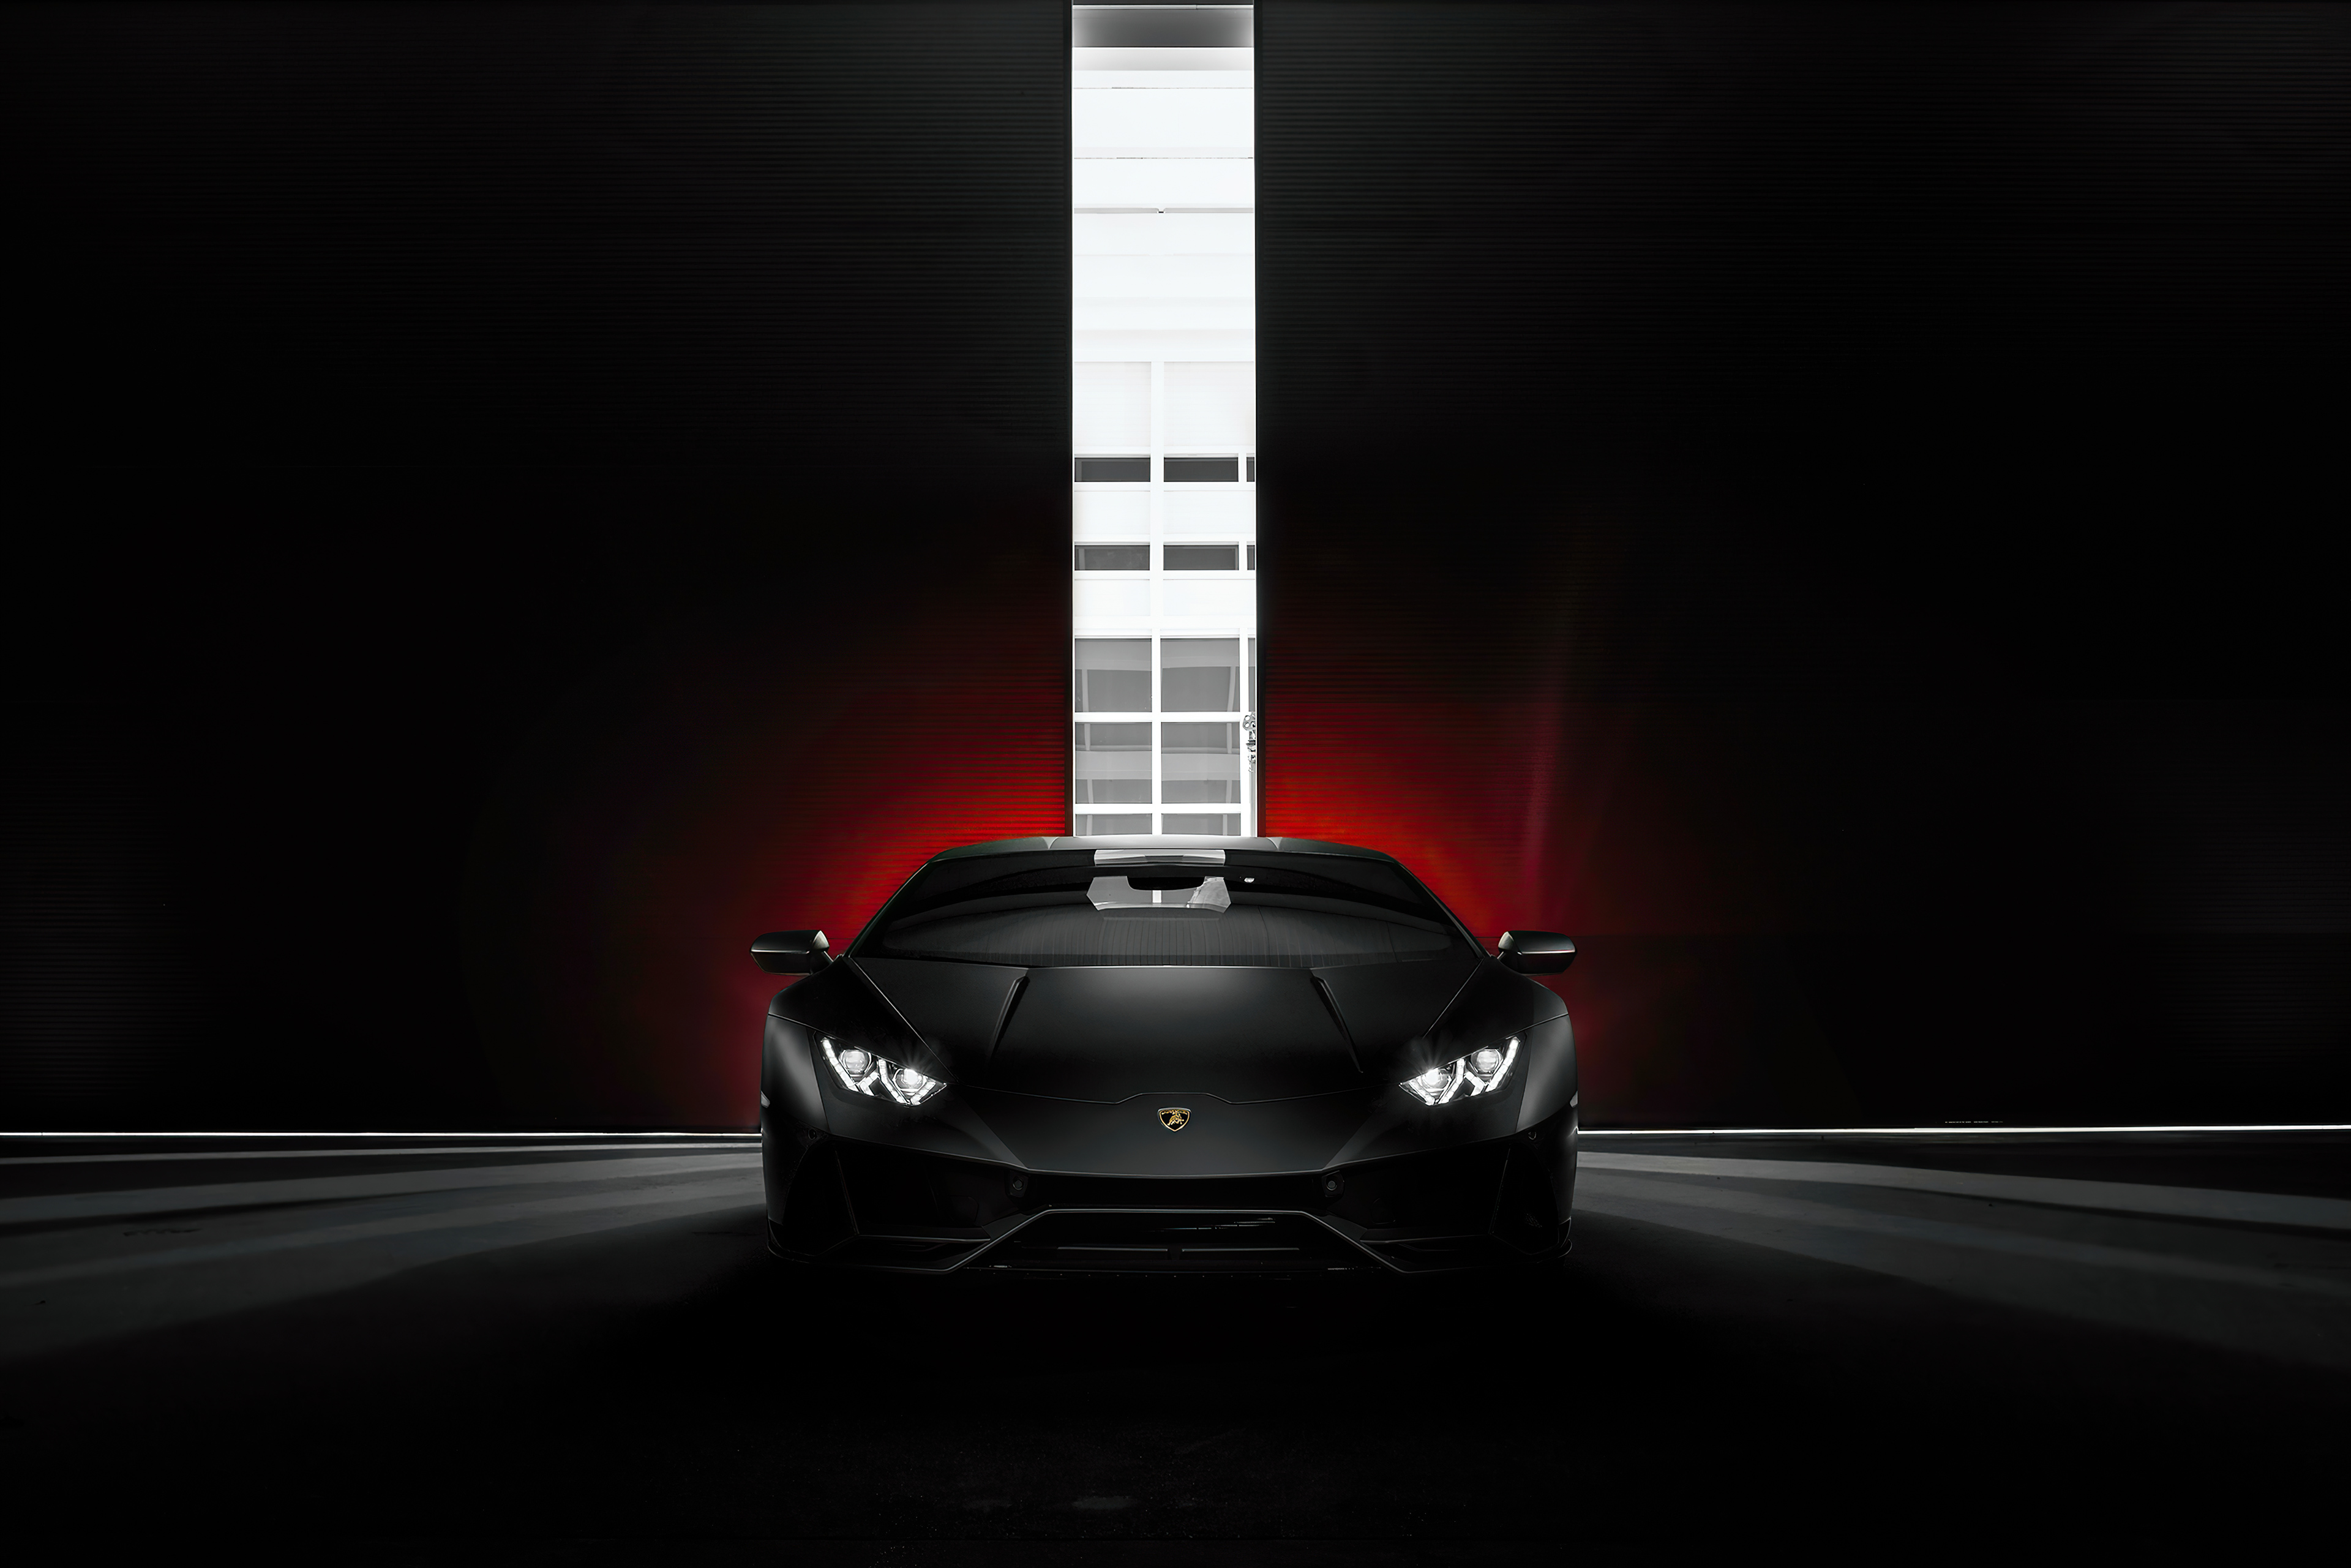 lamborghini huracan evo black 4k 1618921613 - Lamborghini Huracan Evo Black 4k - Lamborghini Huracan Evo Black 4k wallpapers